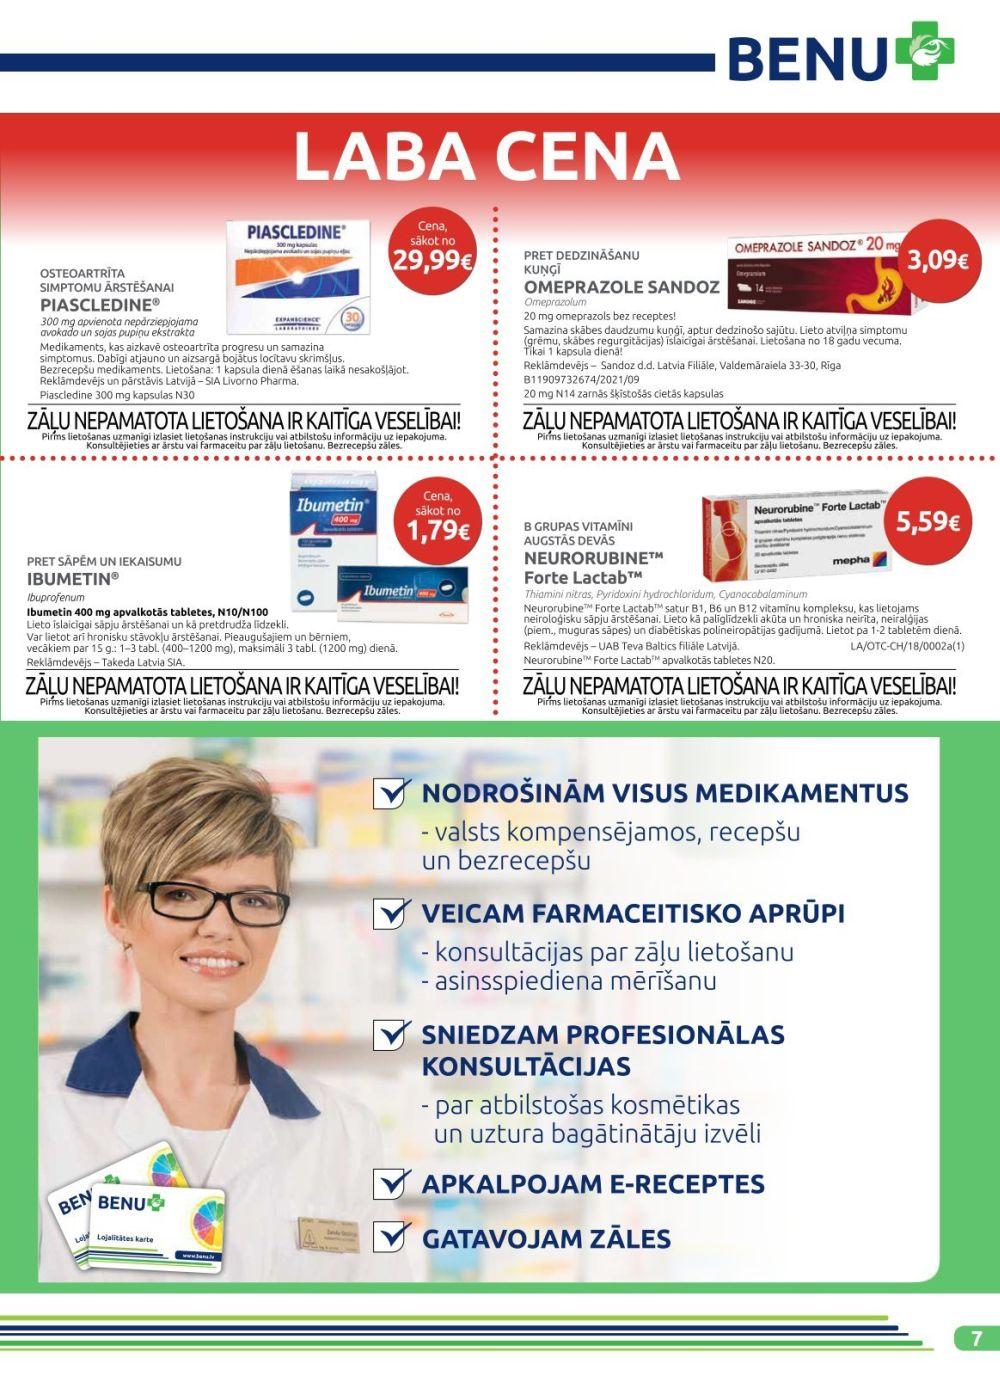 BENU akcijas buklets 01.11.2019 - 30.11.2019